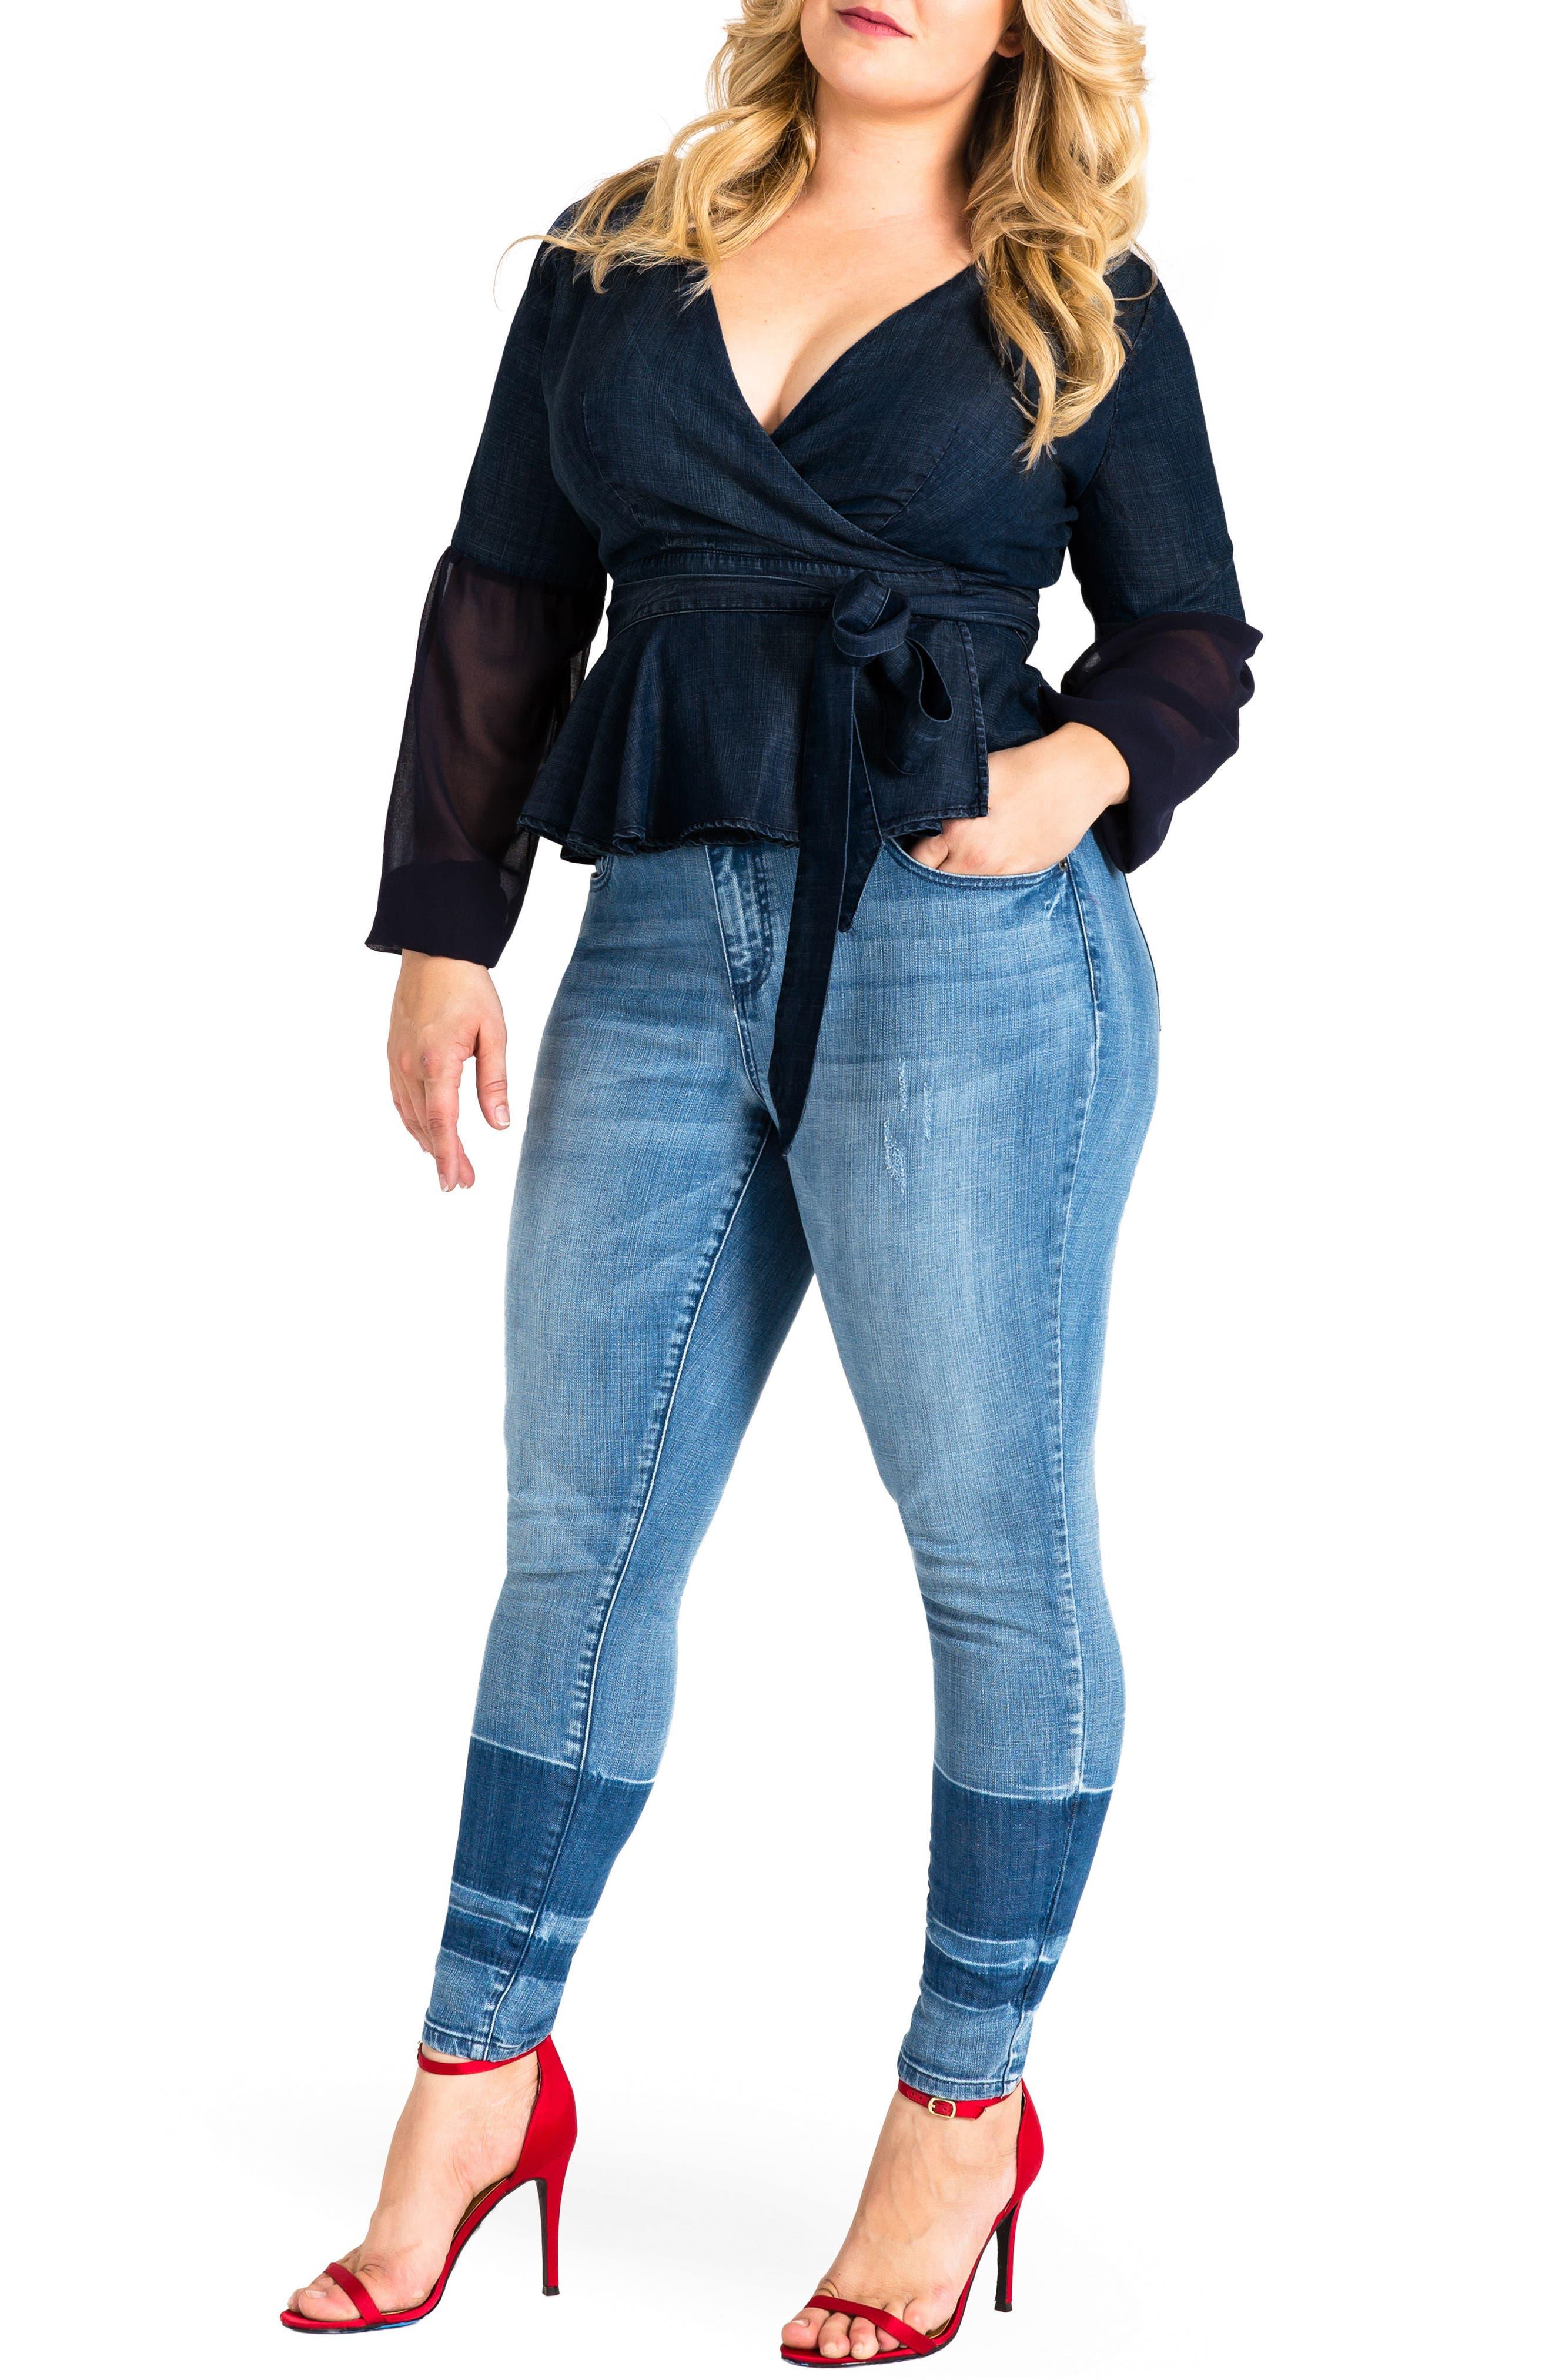 Virginia Ankle Skinny Jeans,                             Alternate thumbnail 4, color,                             MEDIUM BLUE